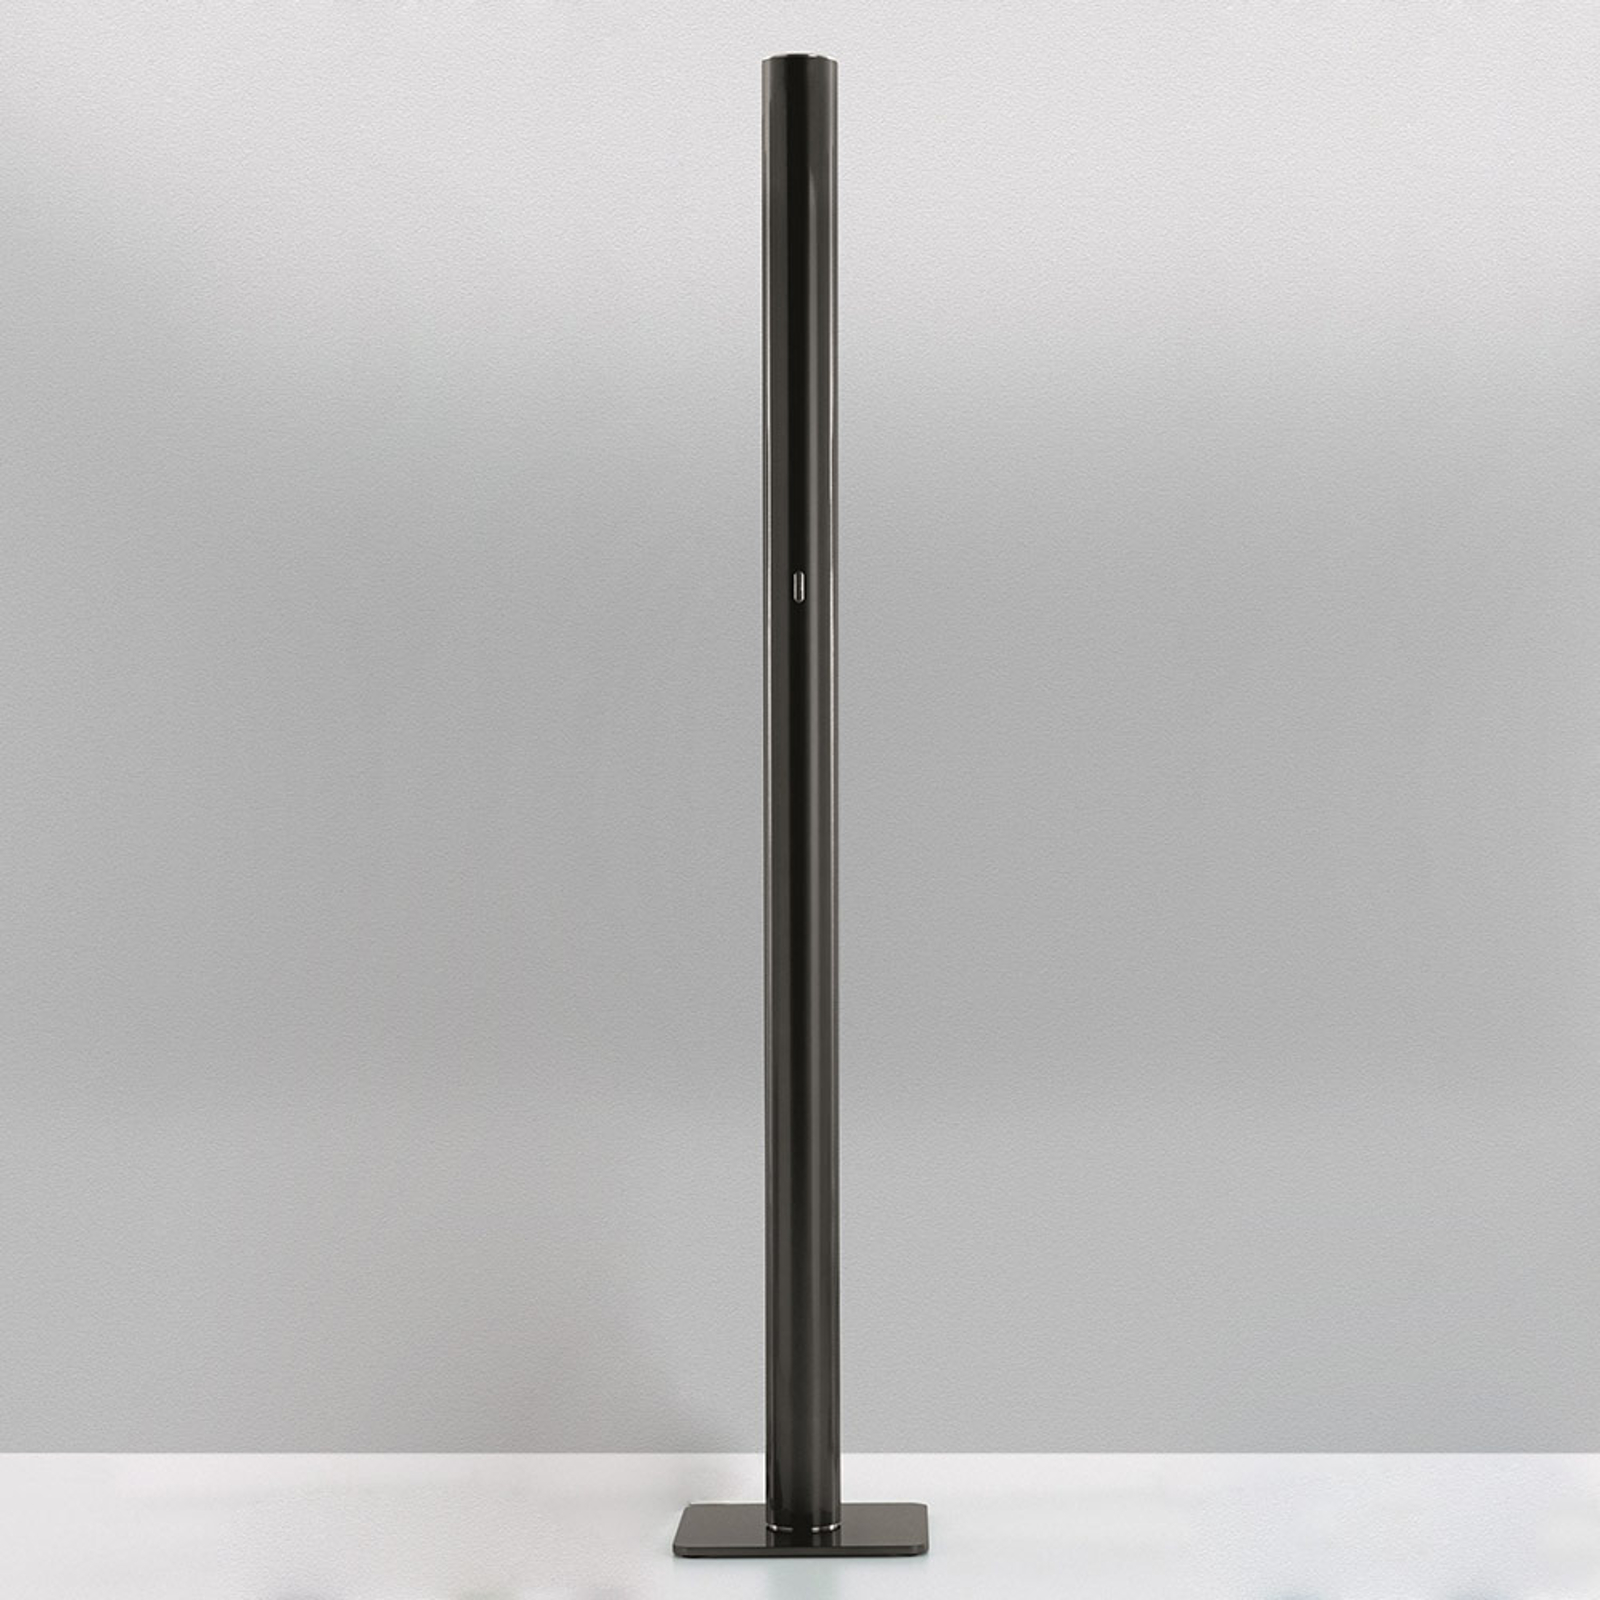 Artemide Ilio LED-lattiavalo sovell. musta 3000K